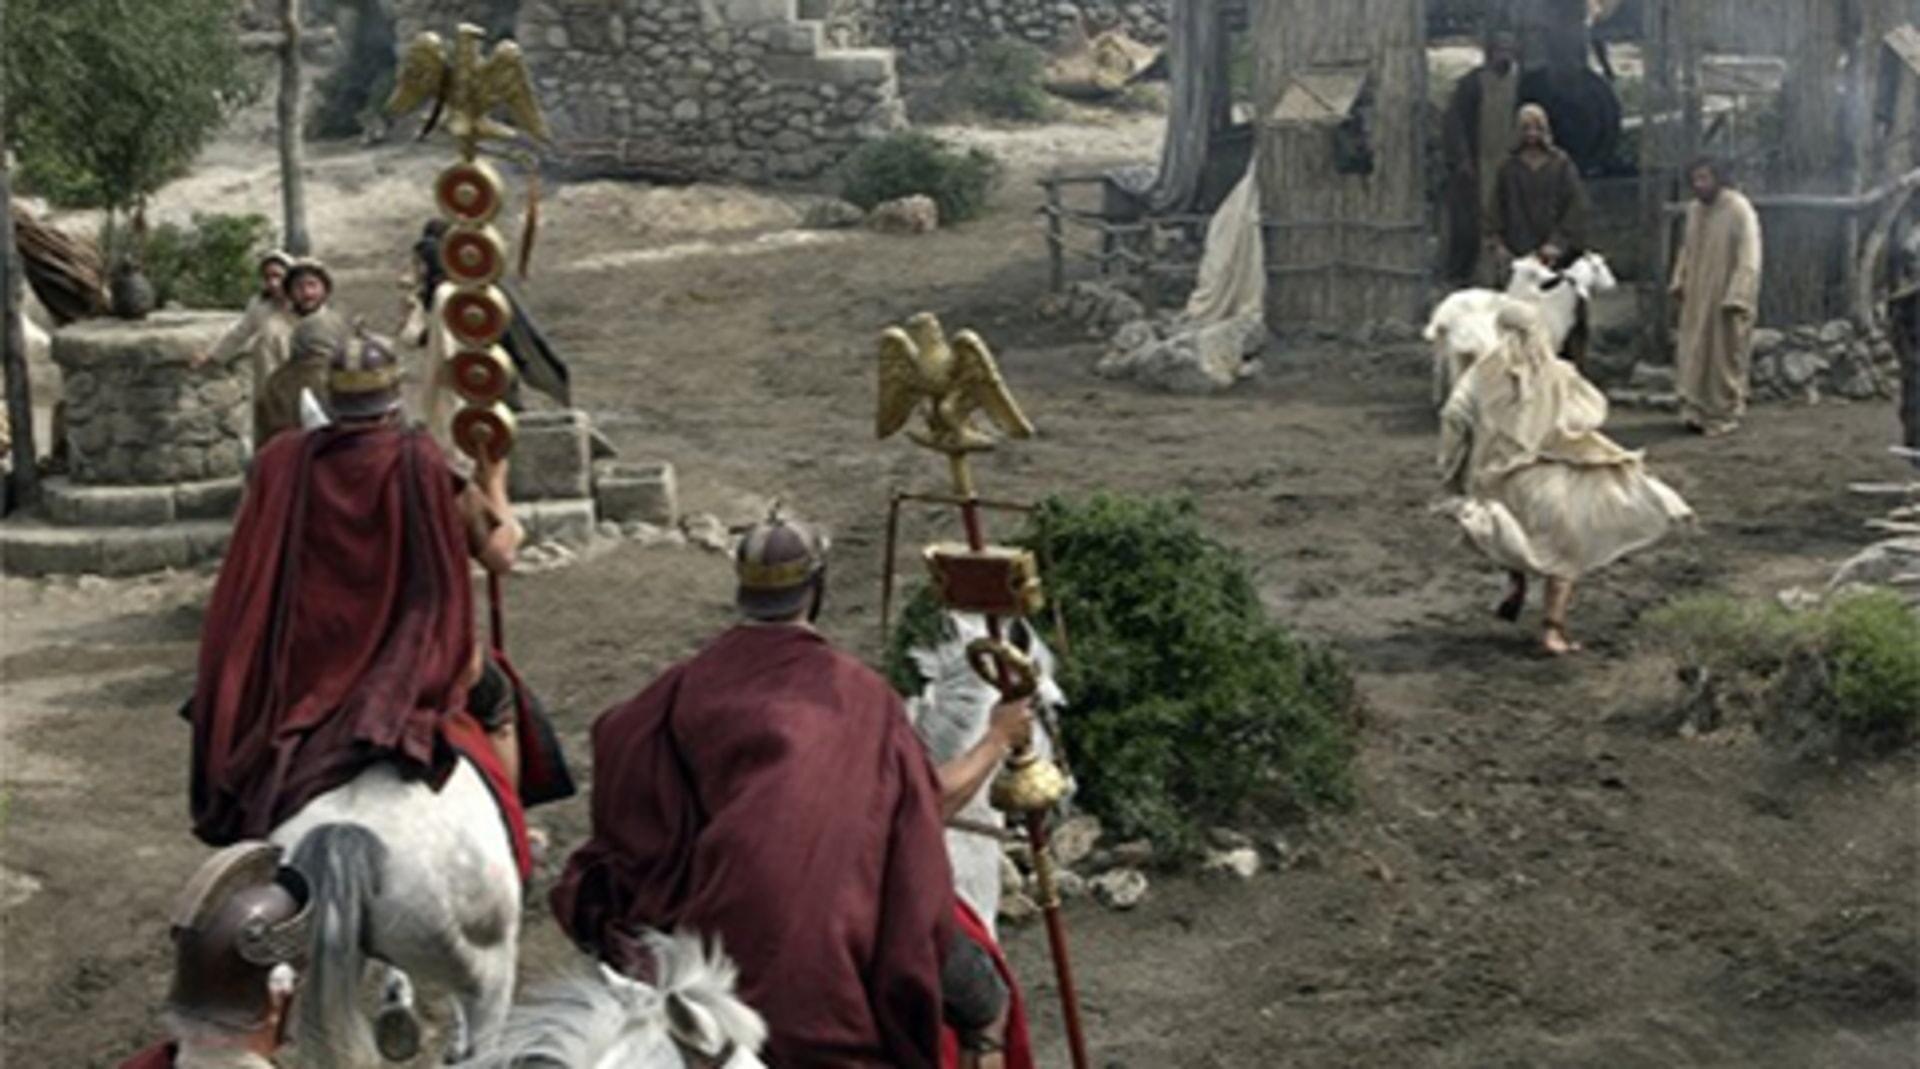 The Nativity Story - Image 3